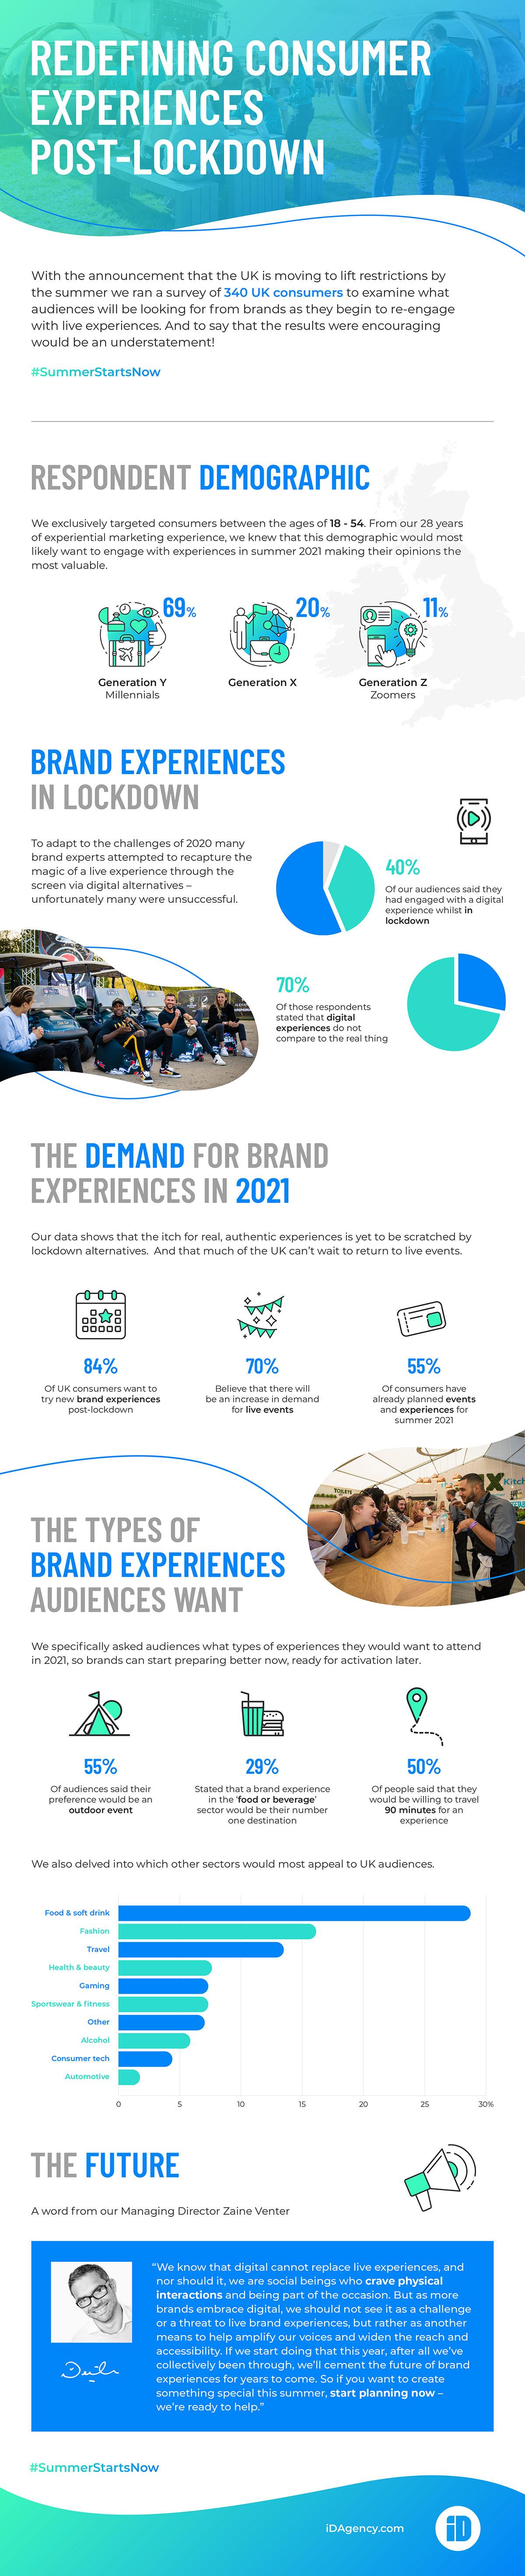 Redefining Consumer Experiences Post-Lockdown